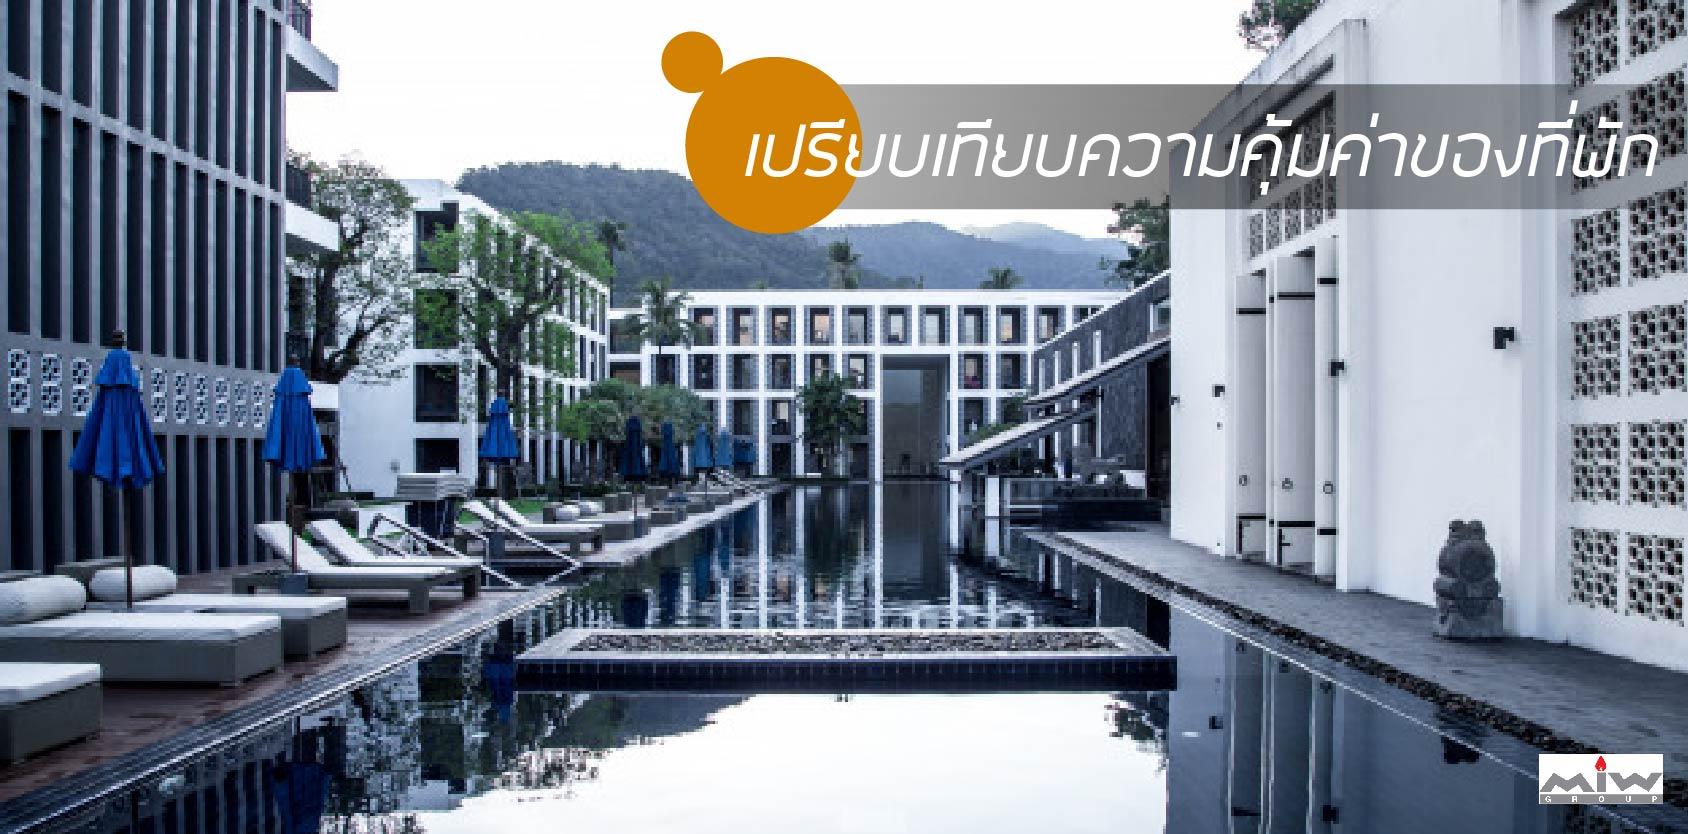 How to choose your accommodation 01 1 - แนะนำวิธีเลือกที่พัก เลือกอย่างไรให้ถูกใจ เที่ยวสนุก ไม่มีสะดุด